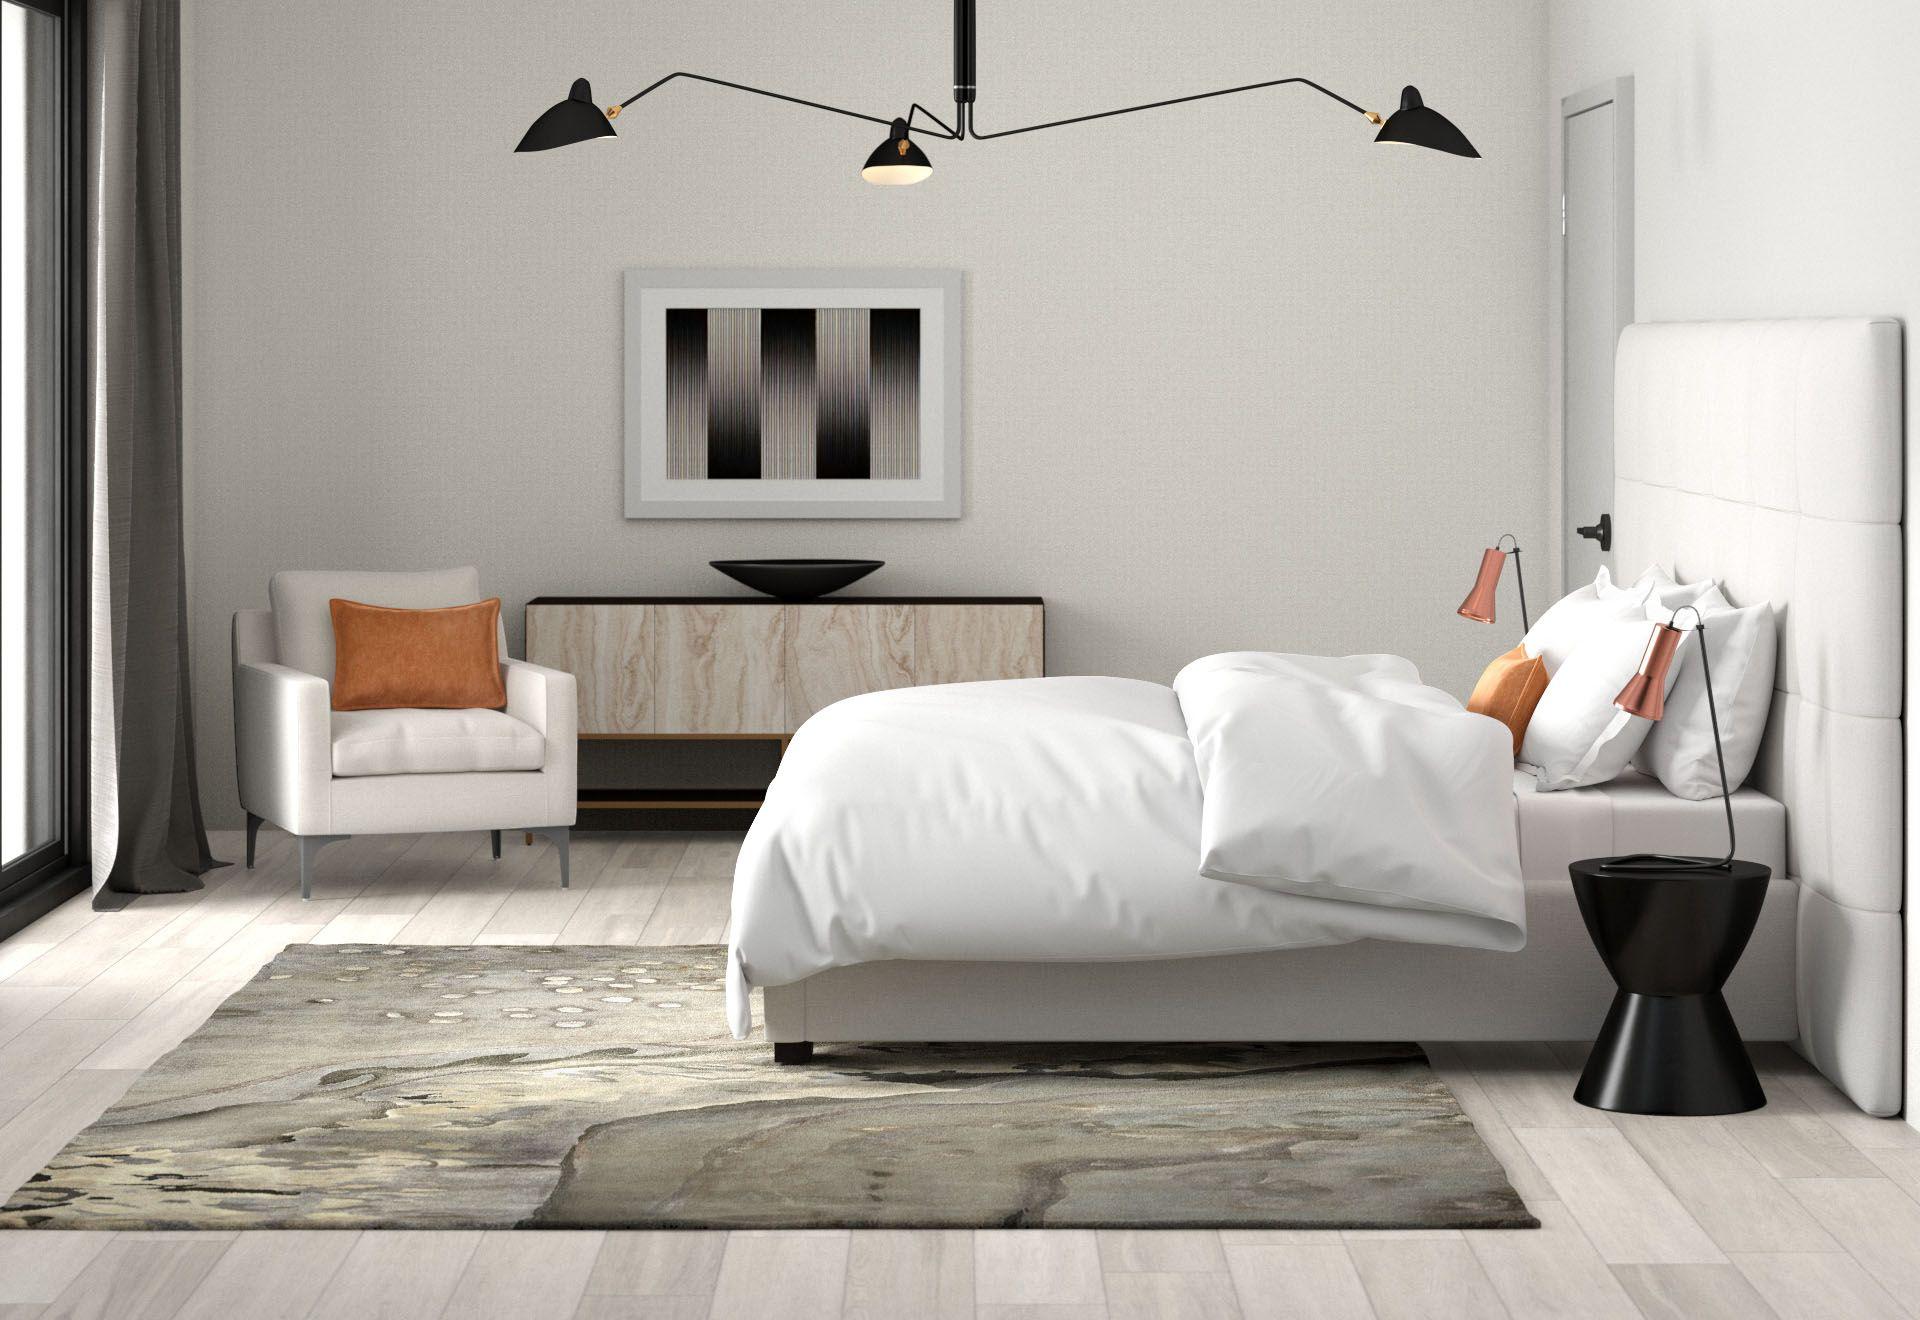 Shop This Modern Bedroom Design Itsallmodern In 2019 Modern Bedroom Design Modern Bedroom Bed